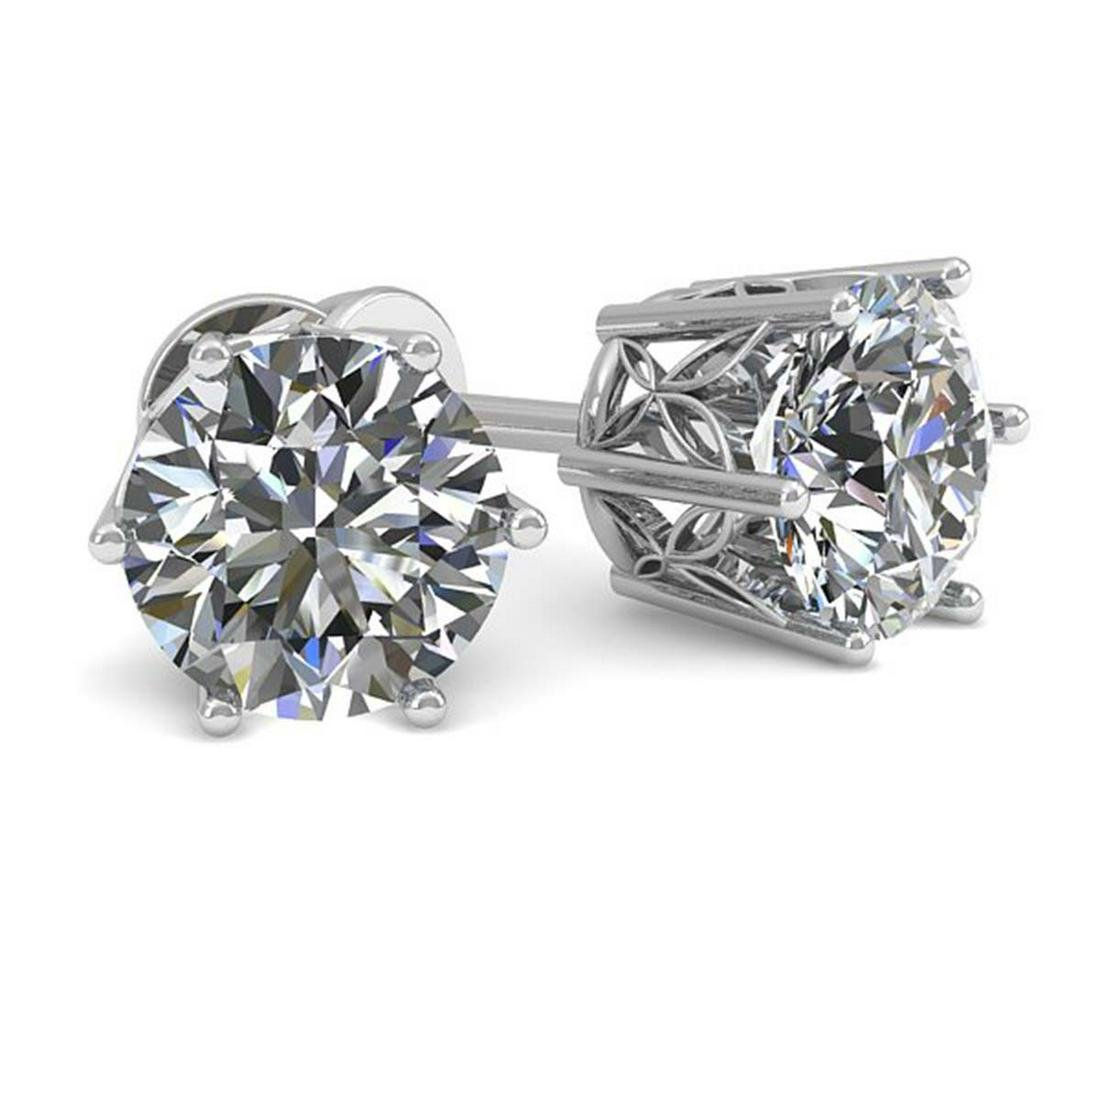 1.05 ctw VS/SI Diamond Stud Art Deco Earrings 14K White